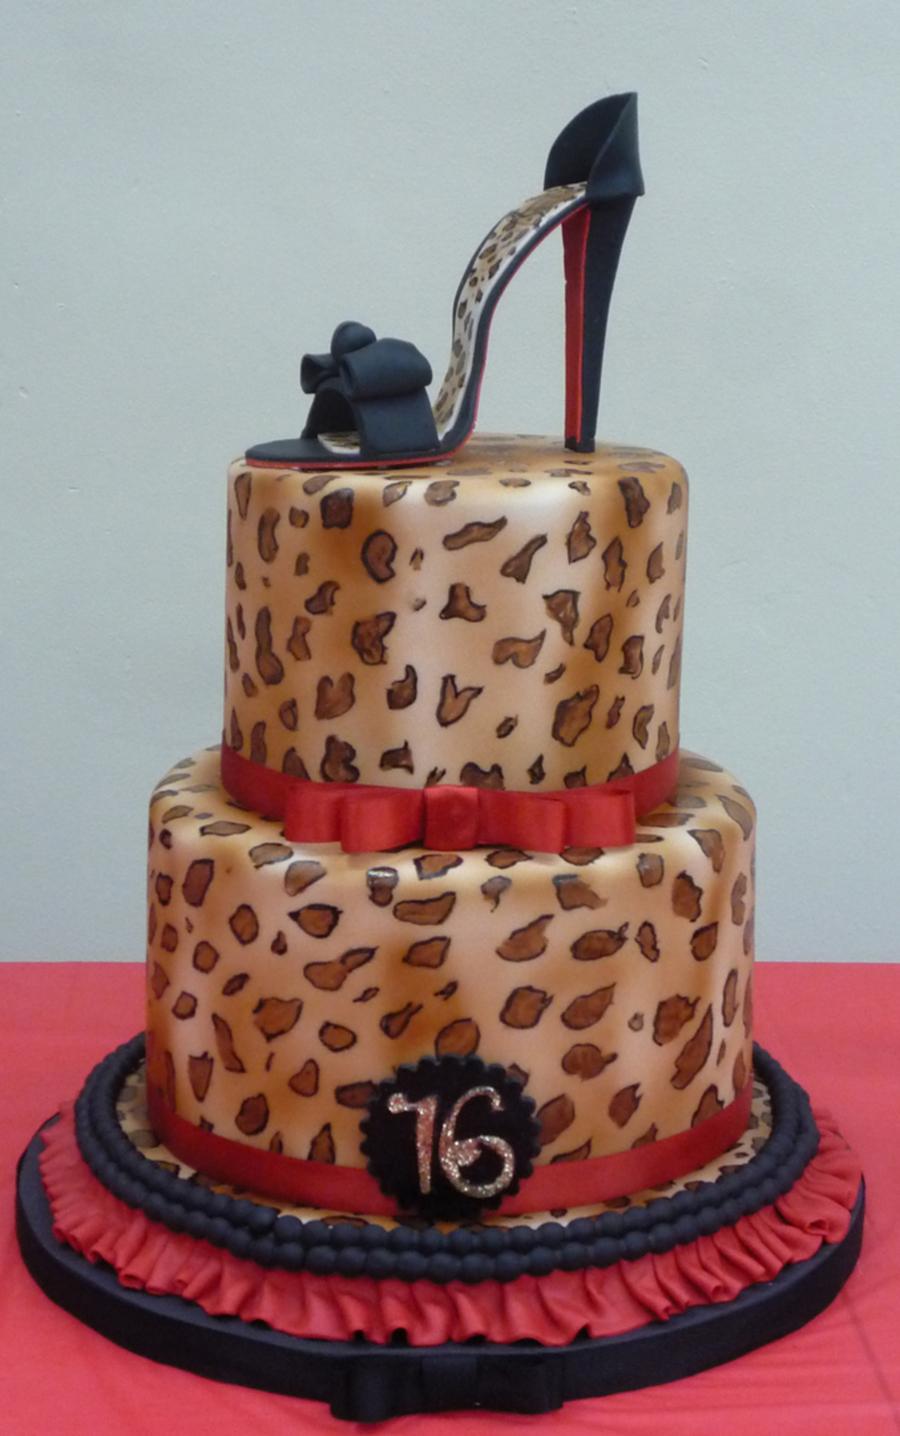 High Heel with Leopard Print Cake